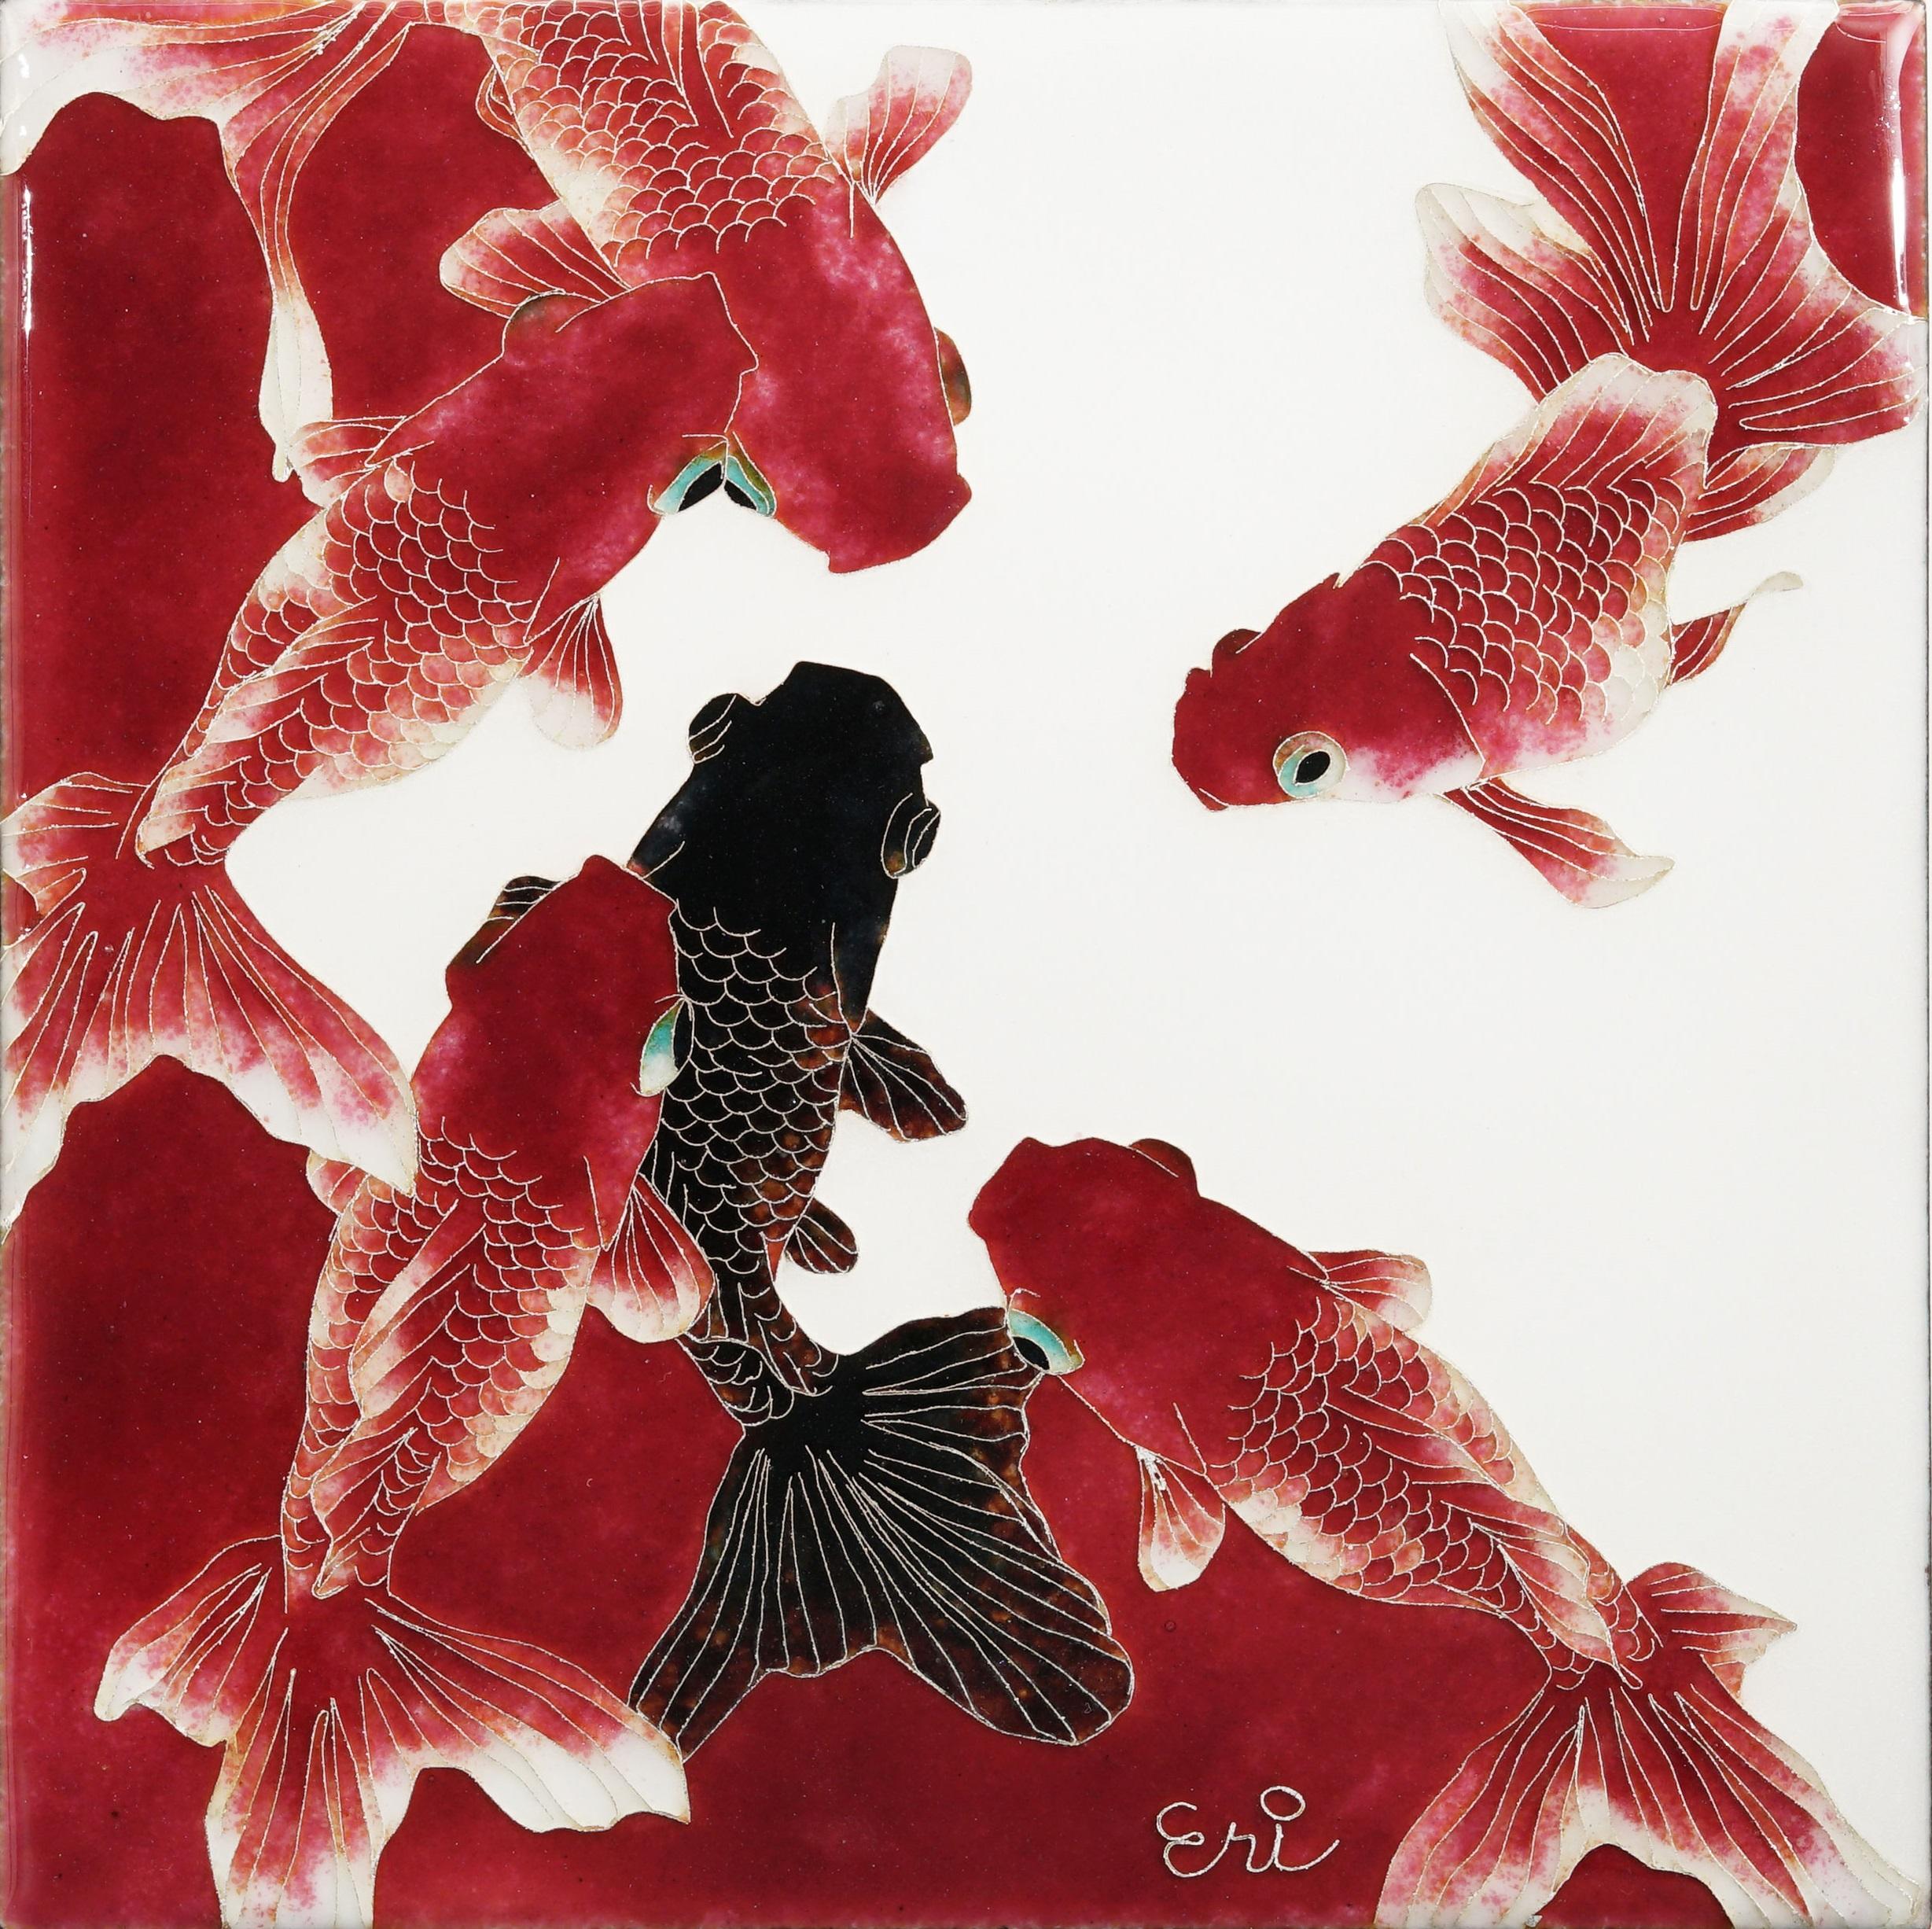 Eri Muranaka, Reds and the Black: Ryukin Goldfish, 2021, Cloisonné enamel ware (silver enamel,  glass glaze, gold leaf on copper plate)